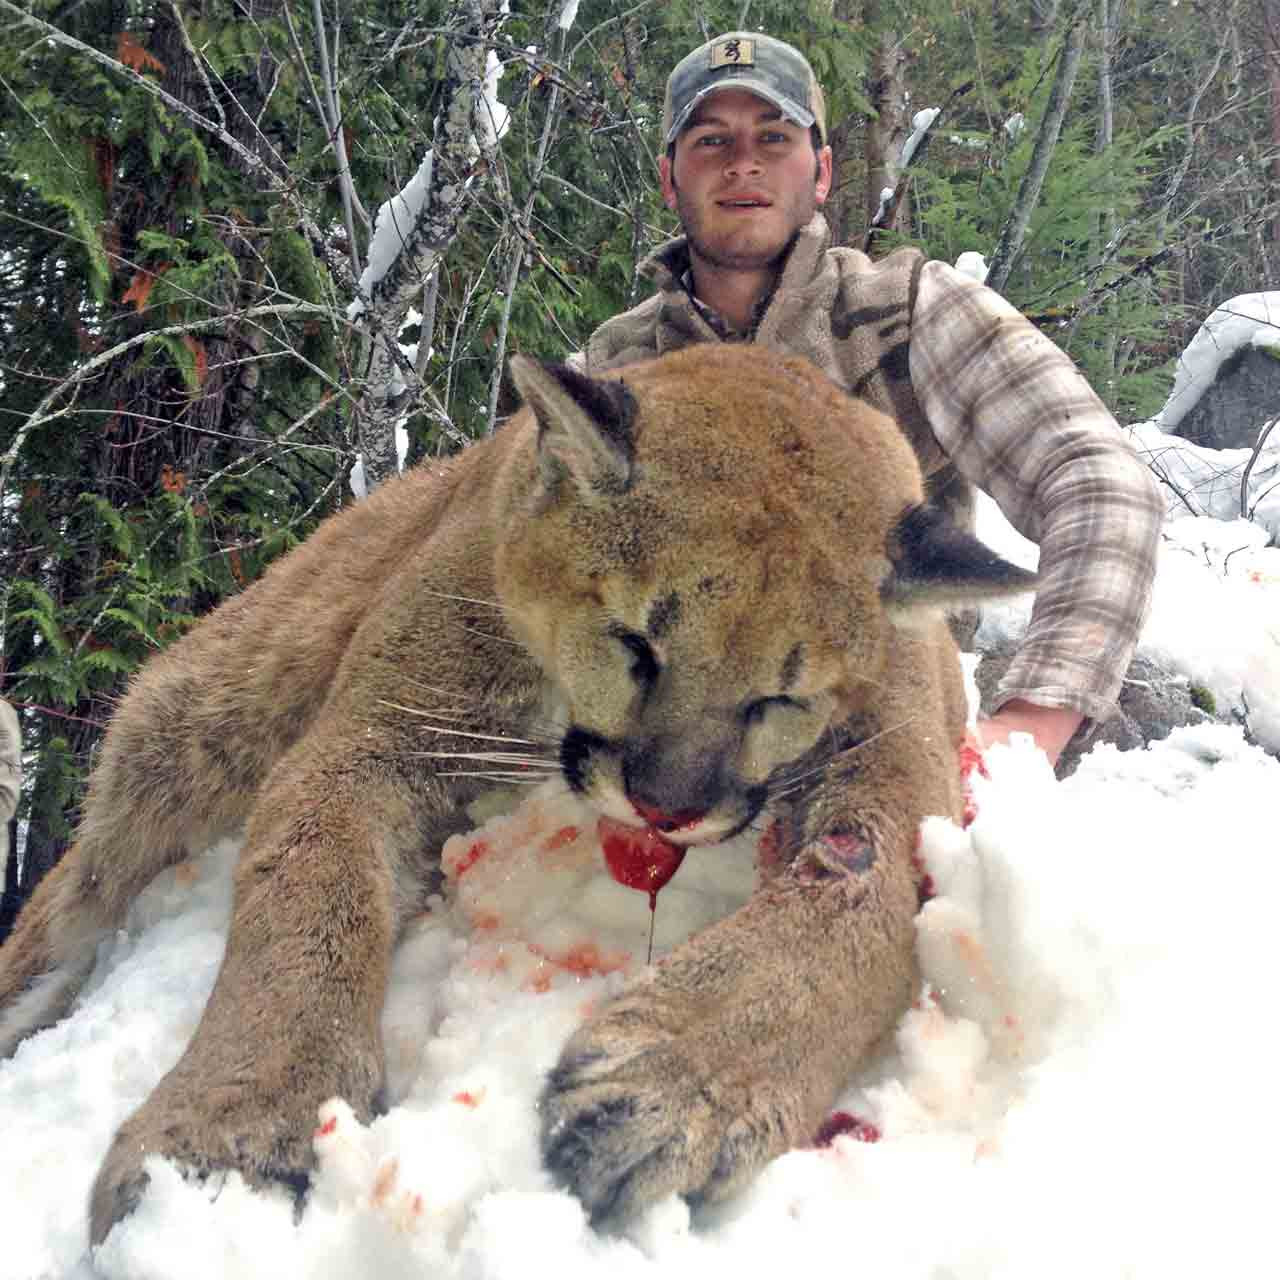 Mountain lion hunt in British Columbia